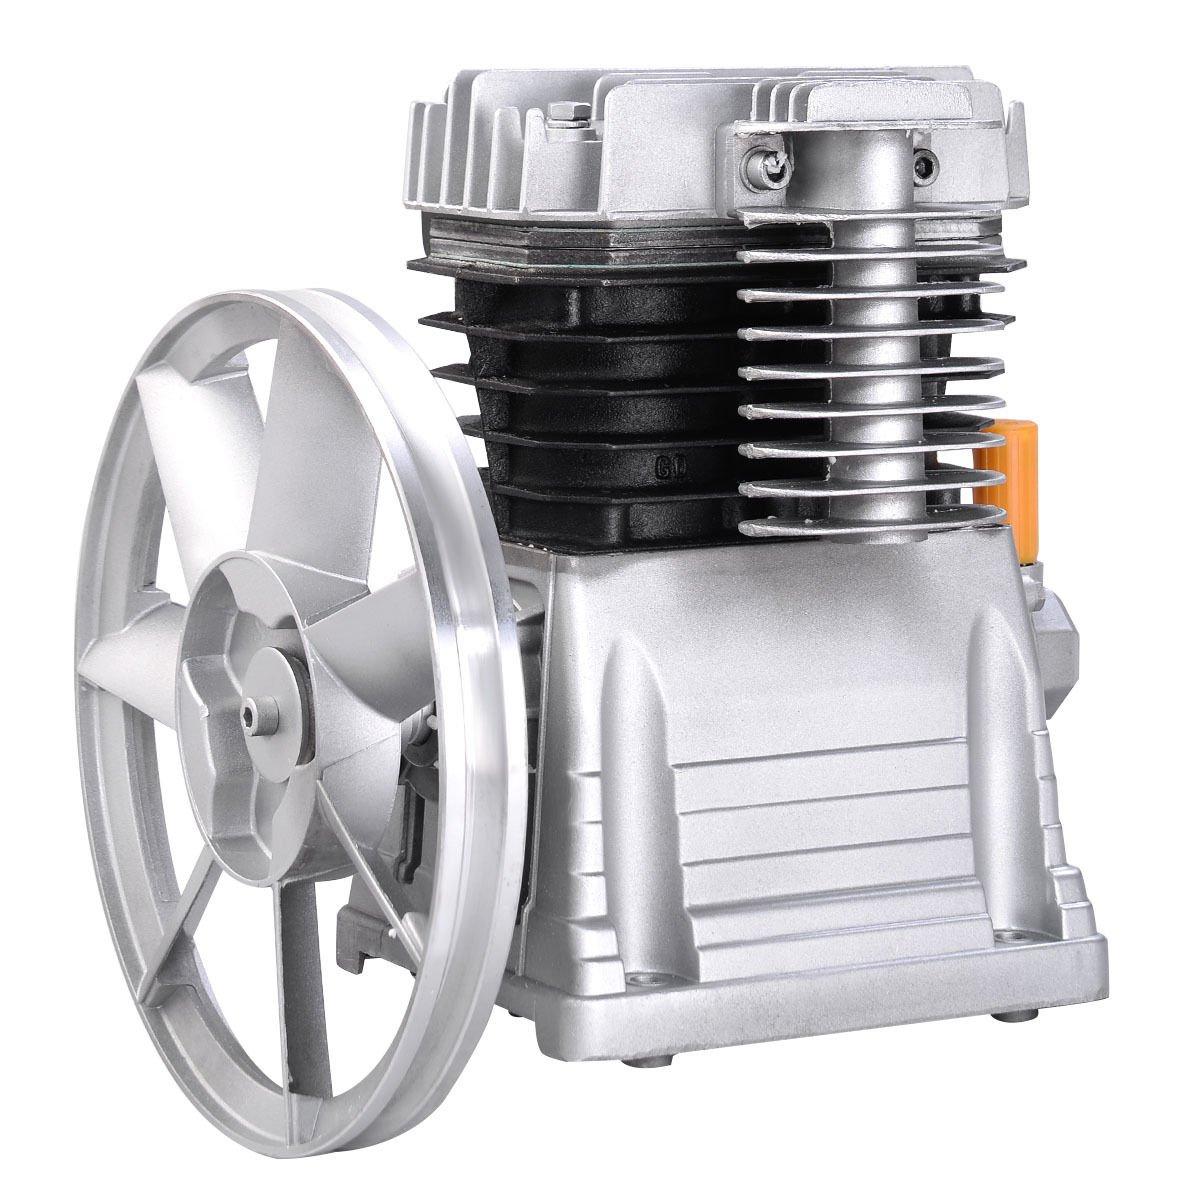 Goplus Aluminum 3HP Air Compressor Head Pump Motor 145PSI 11.5CFM Heavy duty aluminum construction Twin Pistol Air Compressor Head Pump